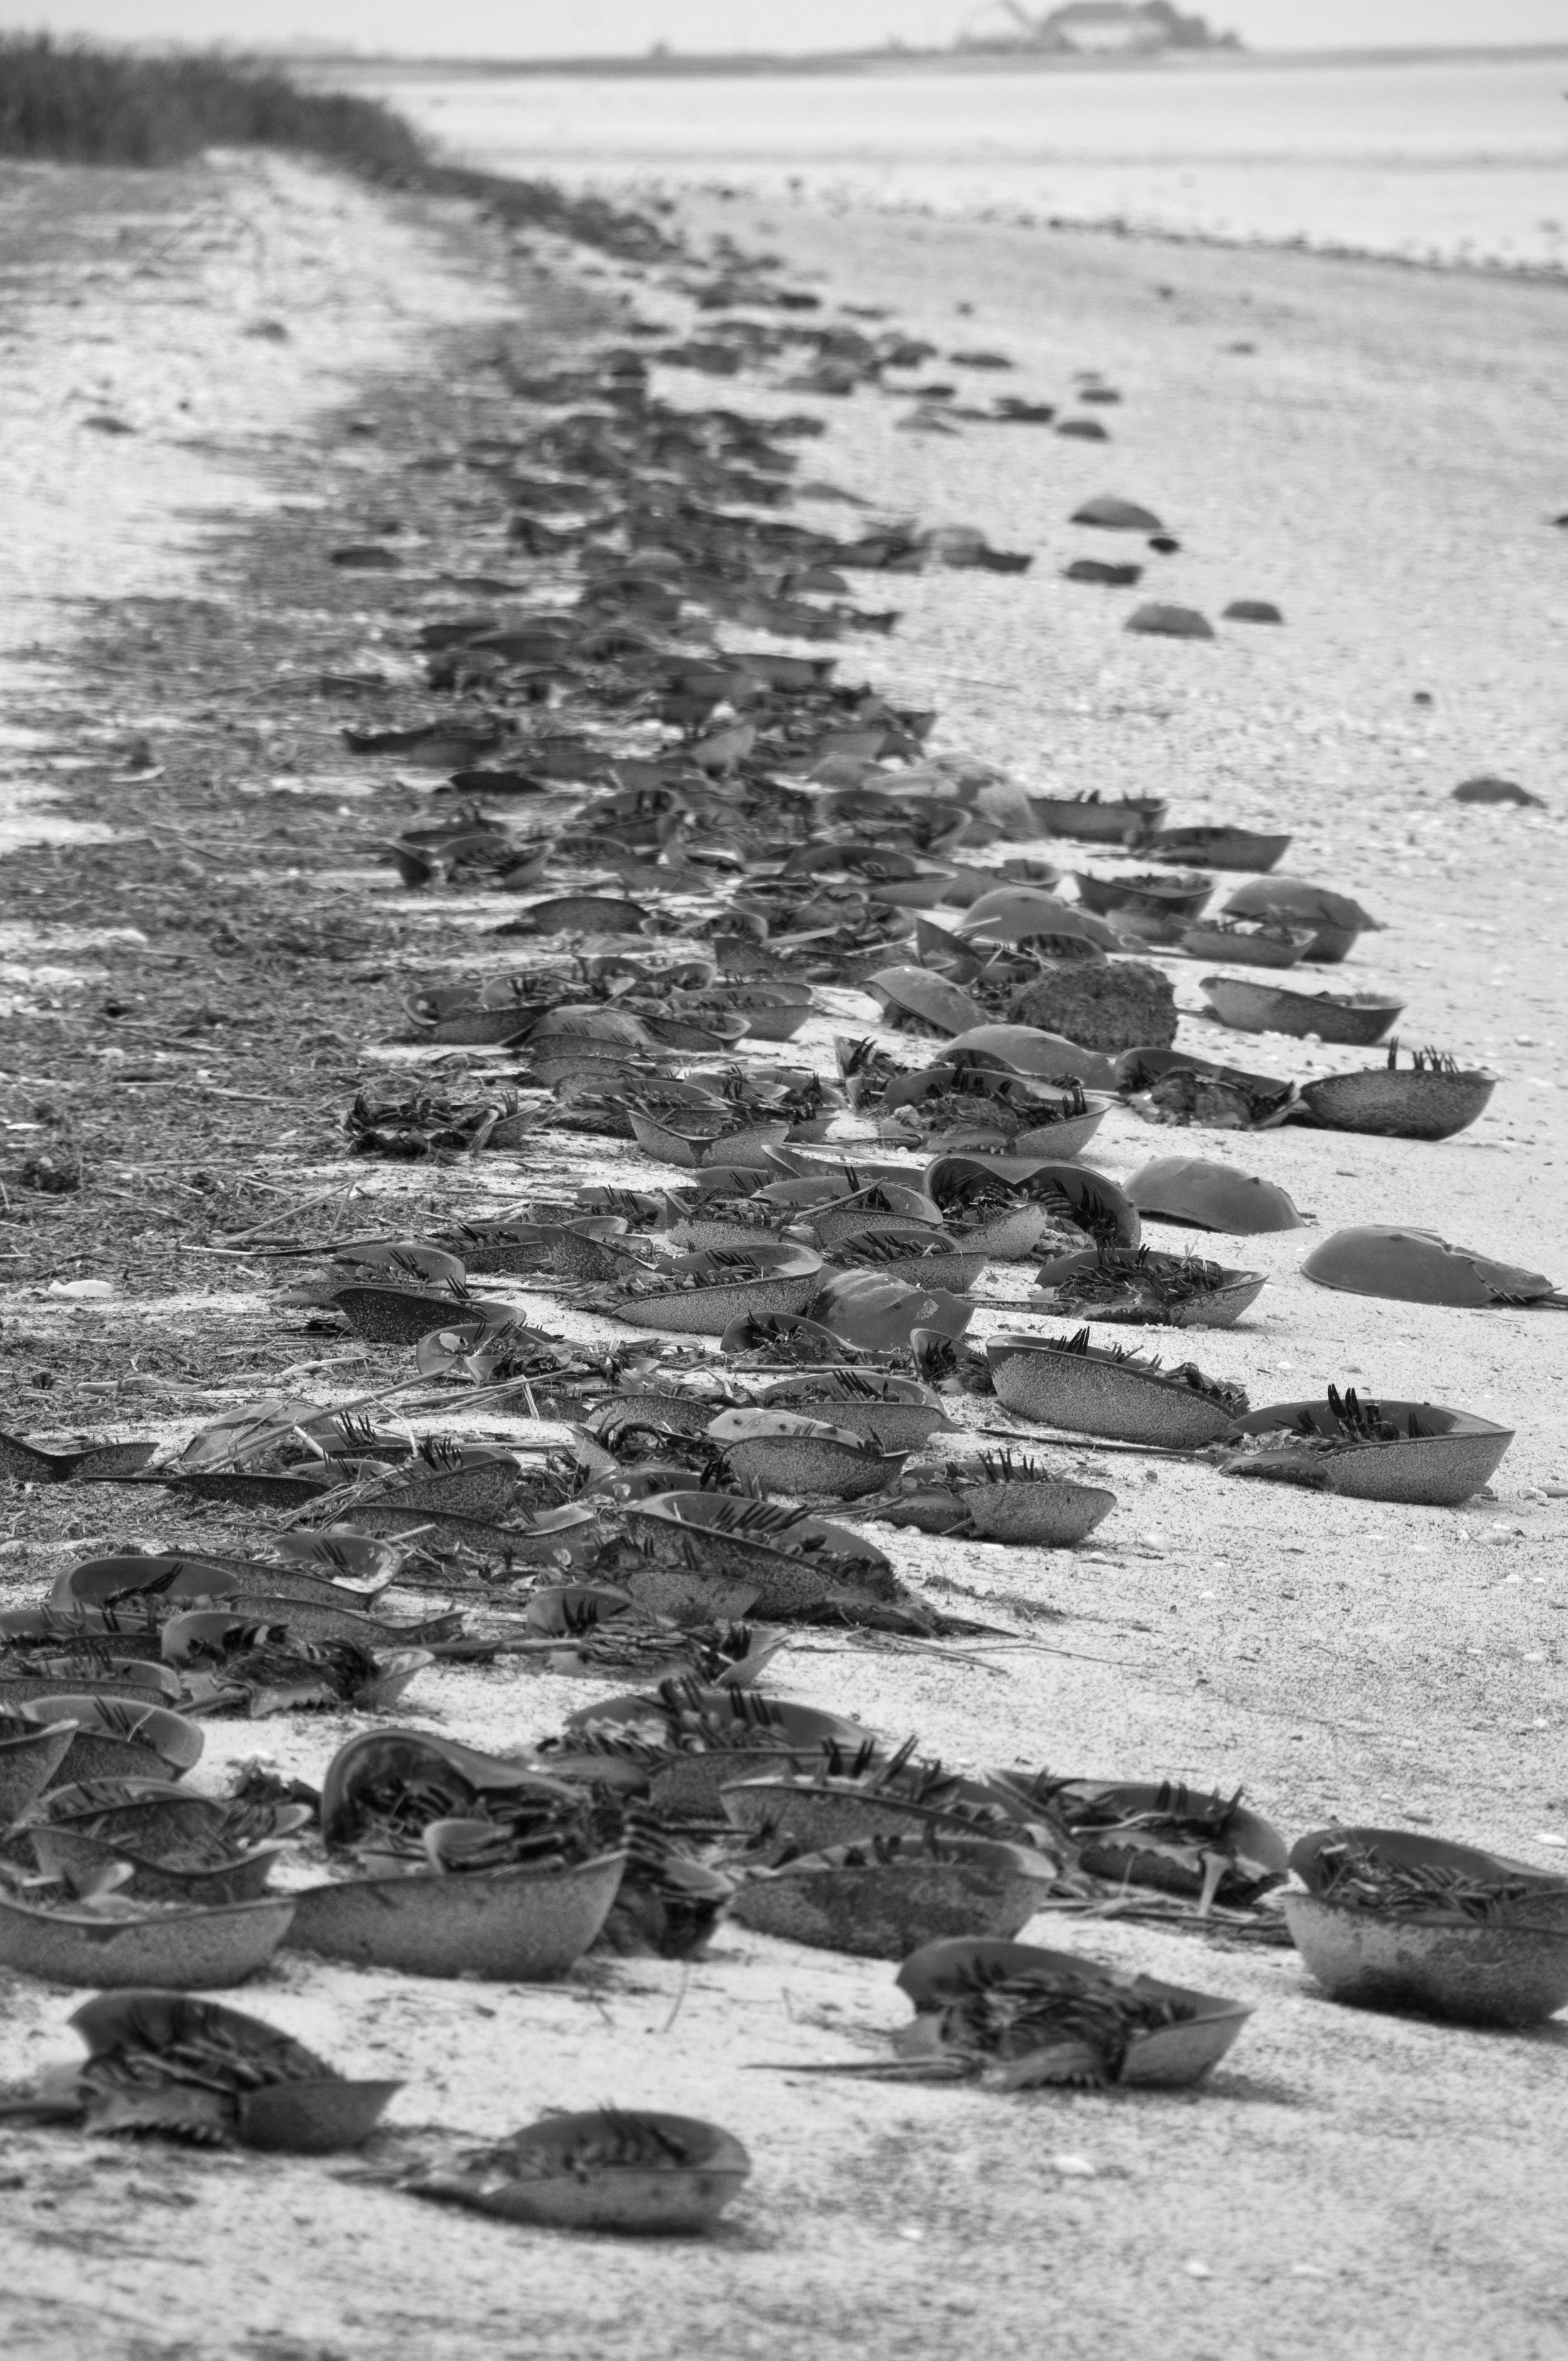 horseshoe crabs Kitts Hummock Beach